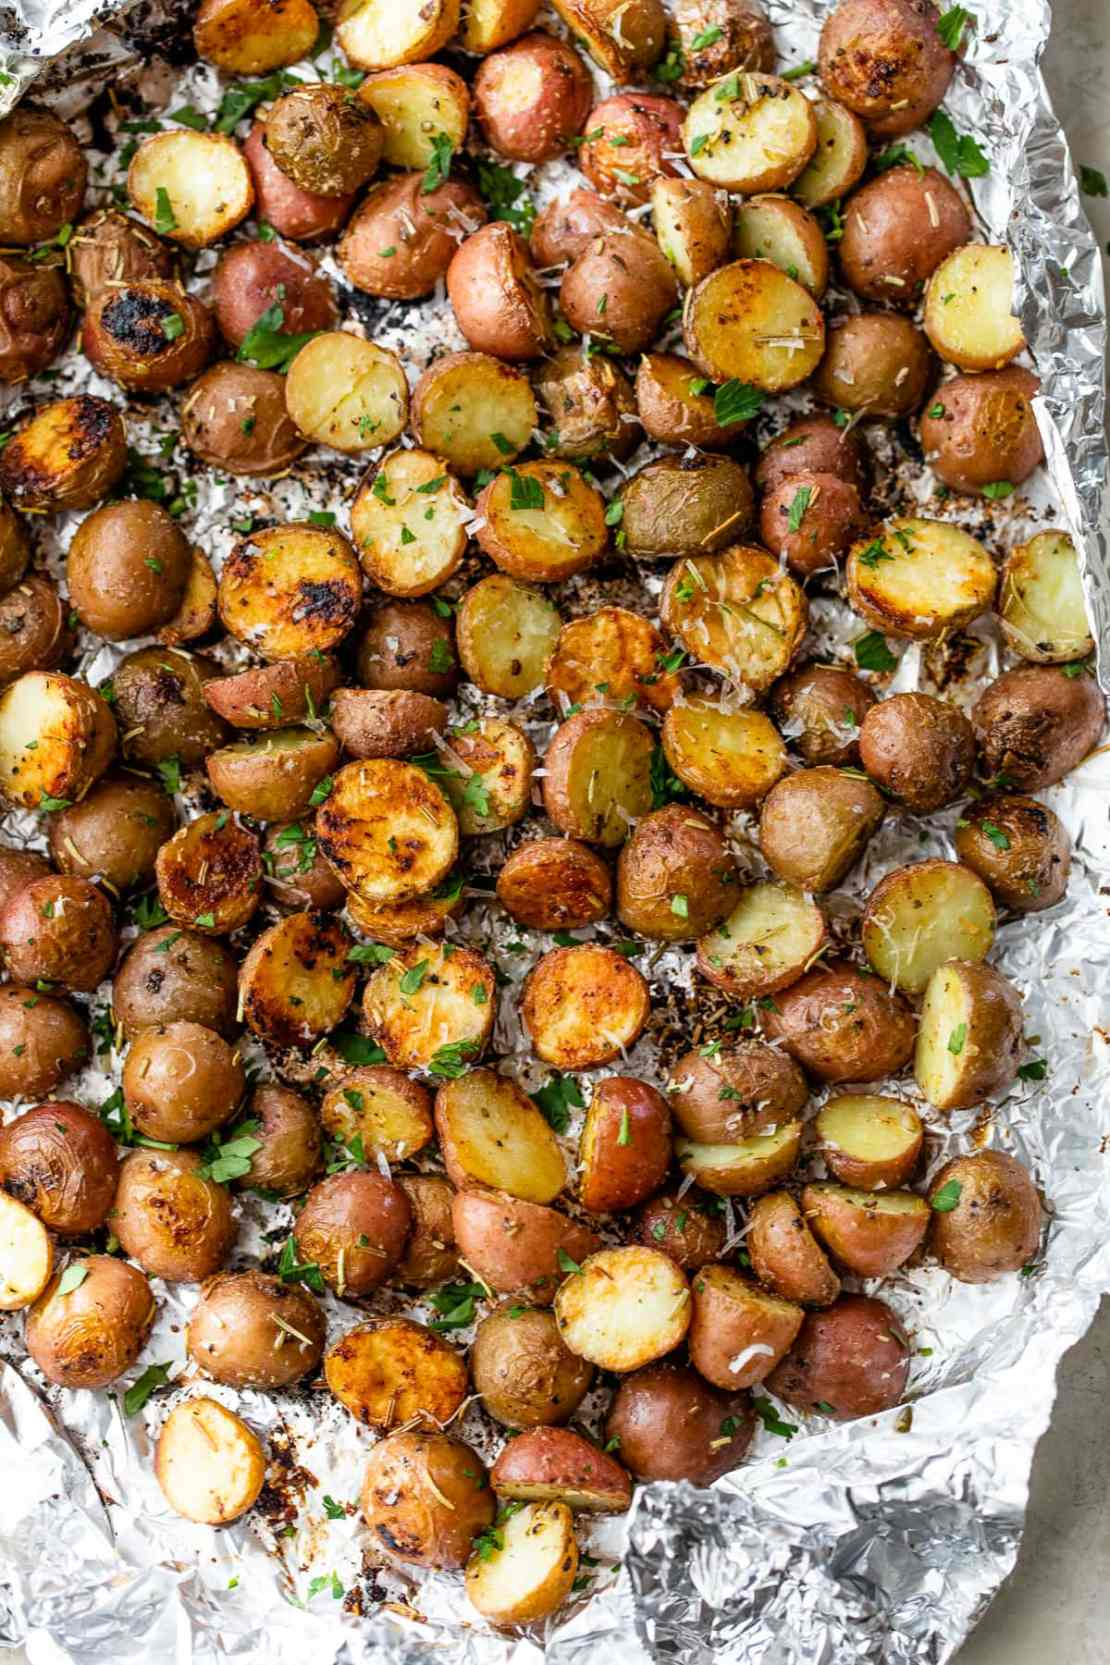 crispy grilled potatoes in foil